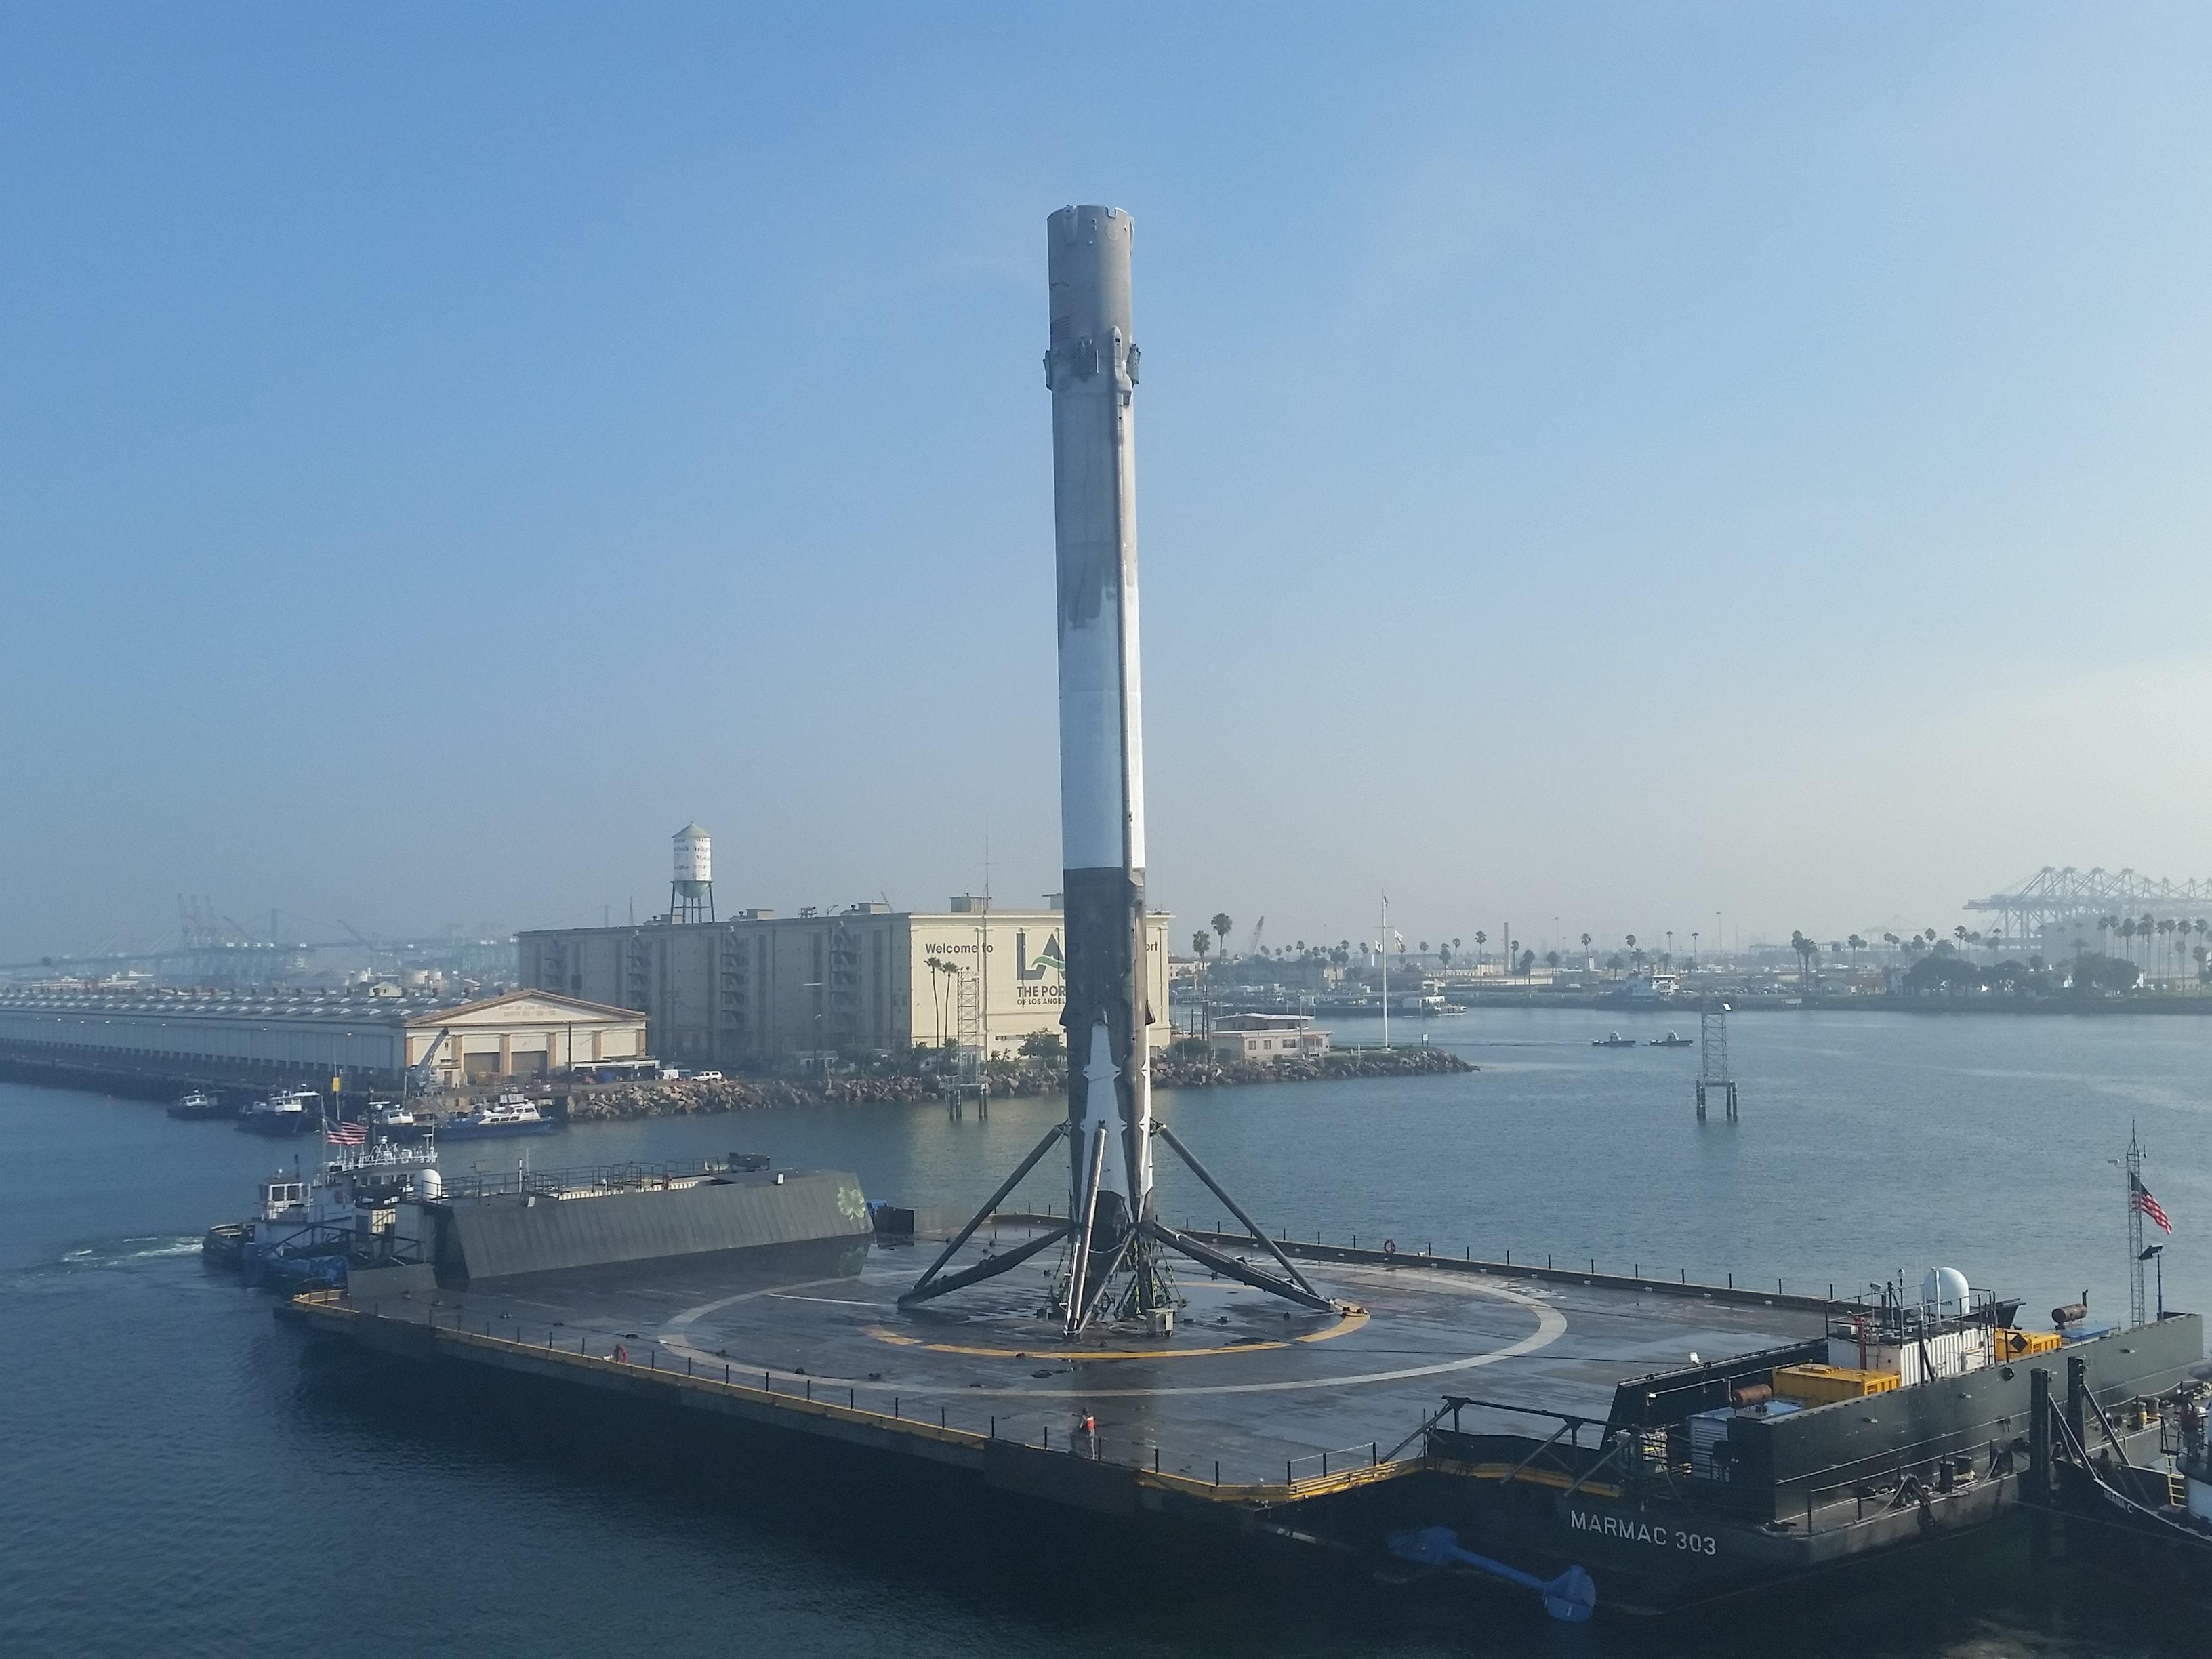 1038 arrives in Port (NASASpaceflight – helodriver)